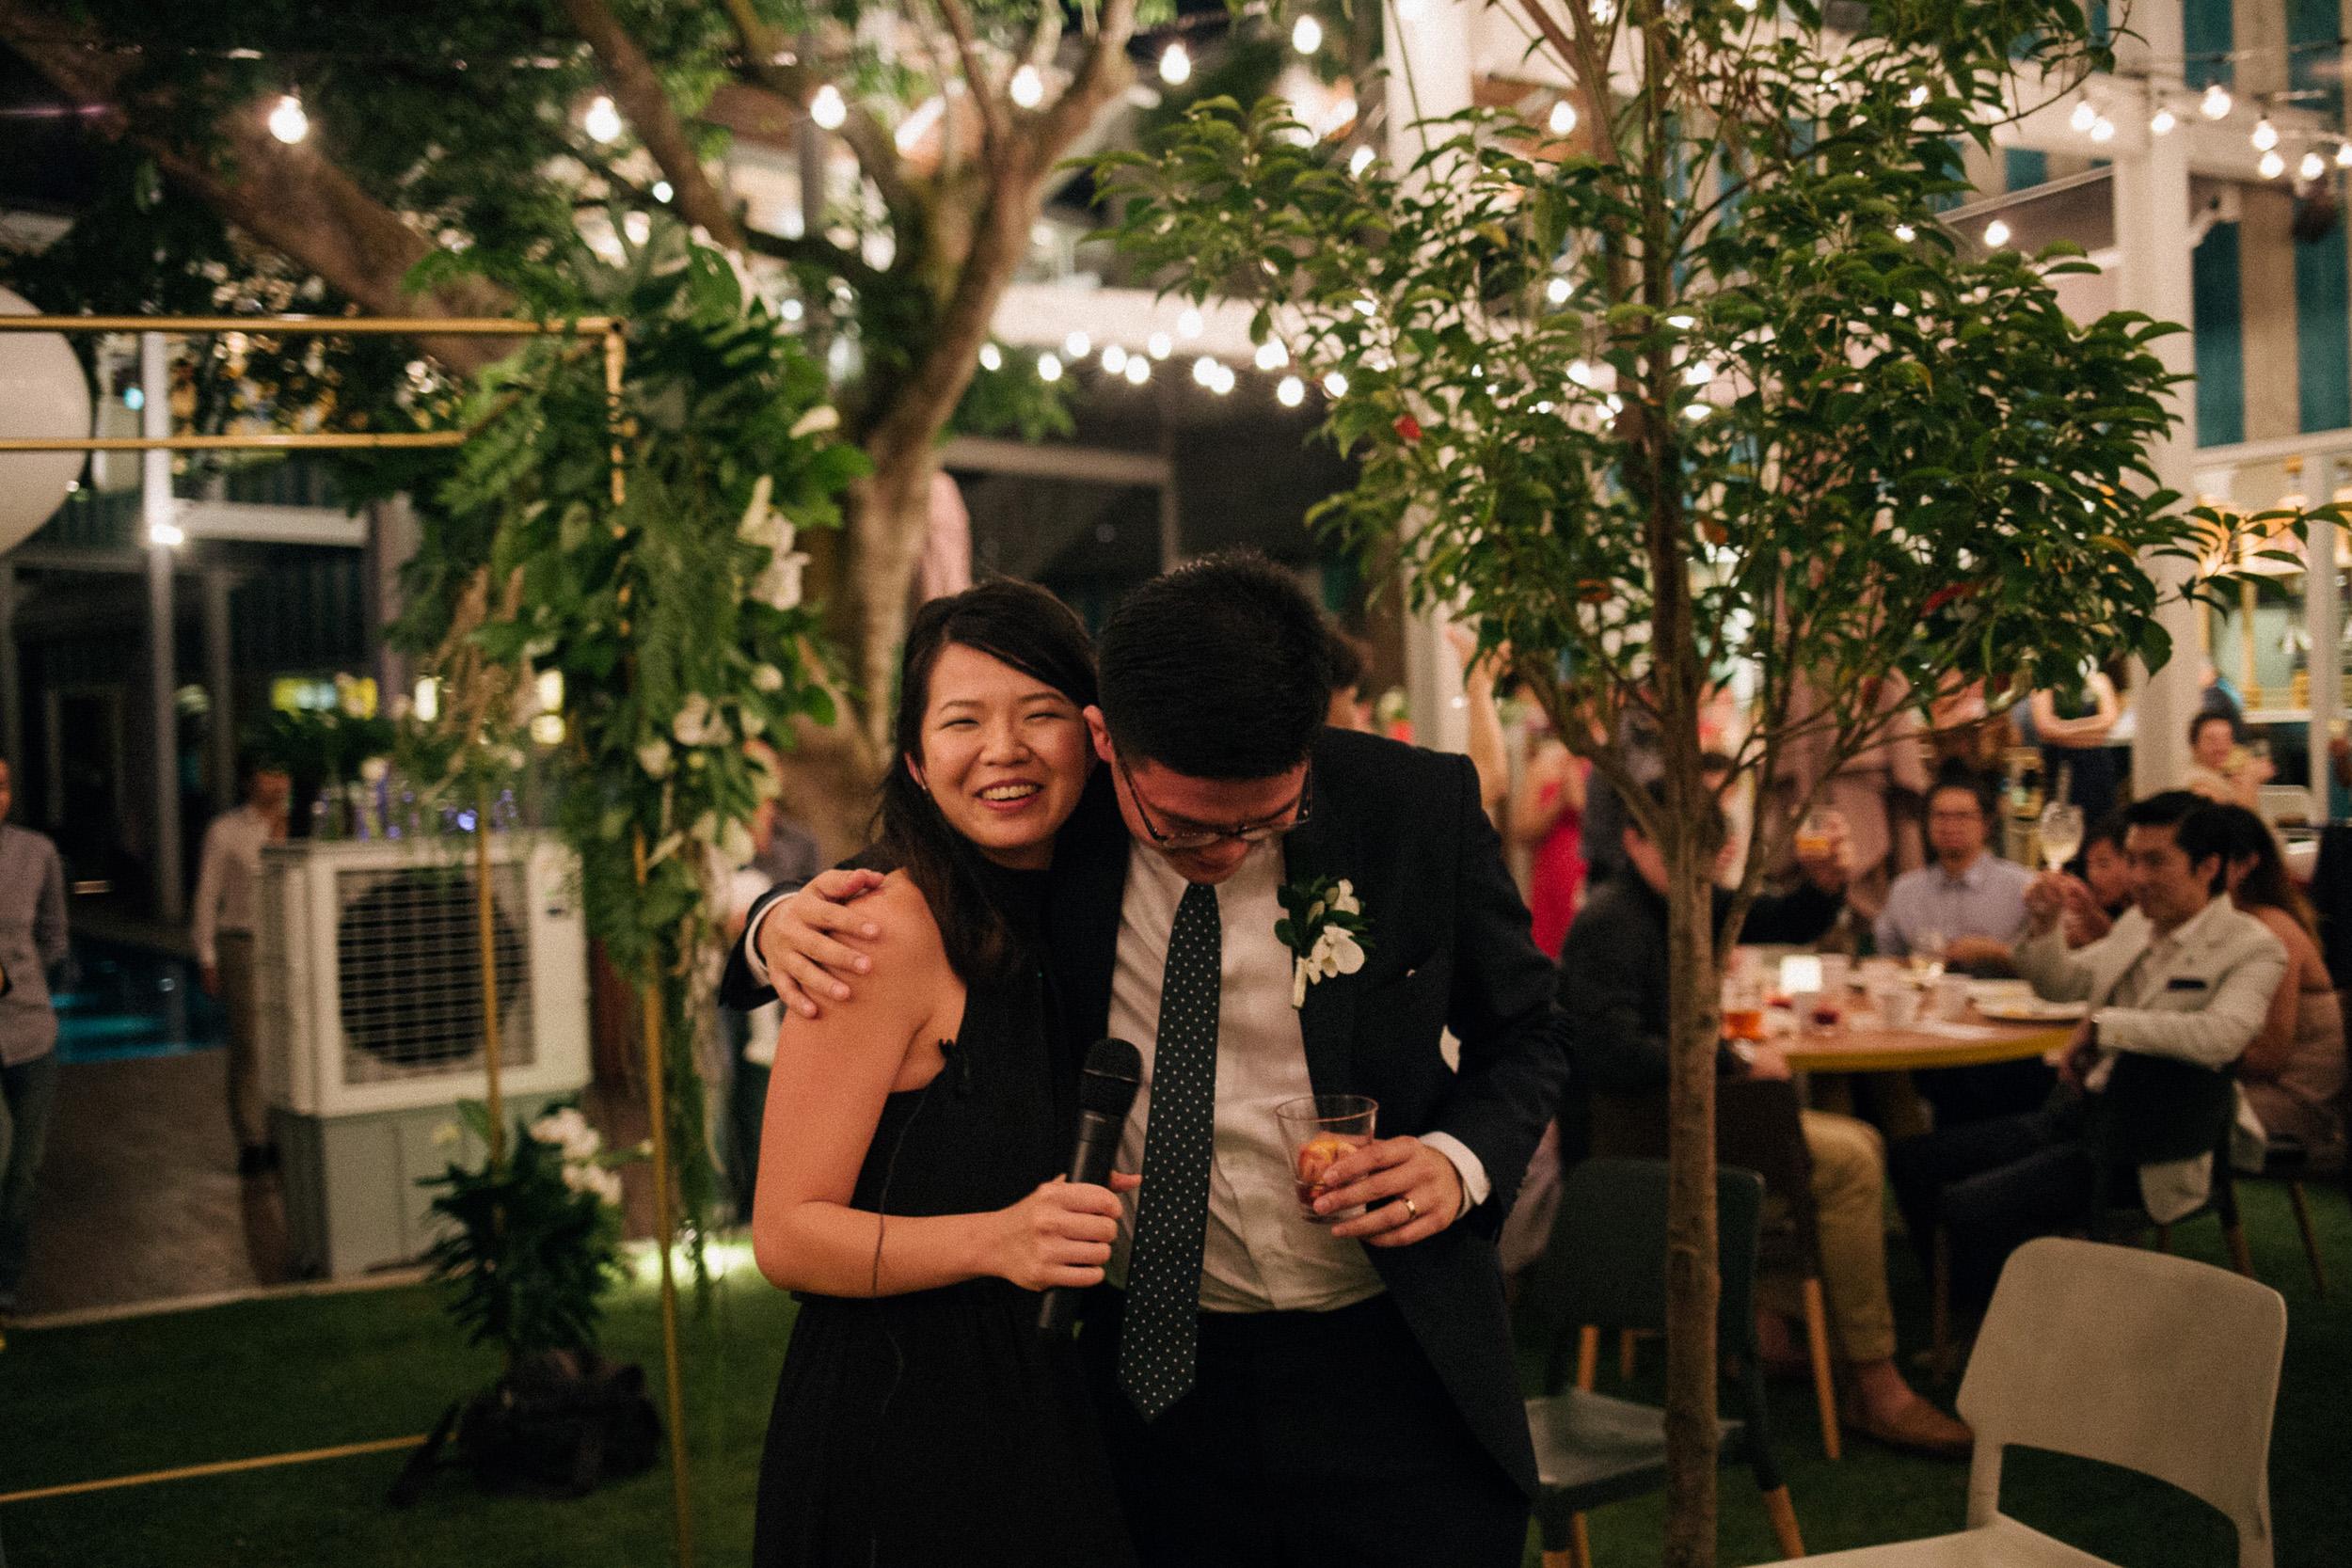 singapore-wedding-photographer-photography-wmt2017-063.jpg